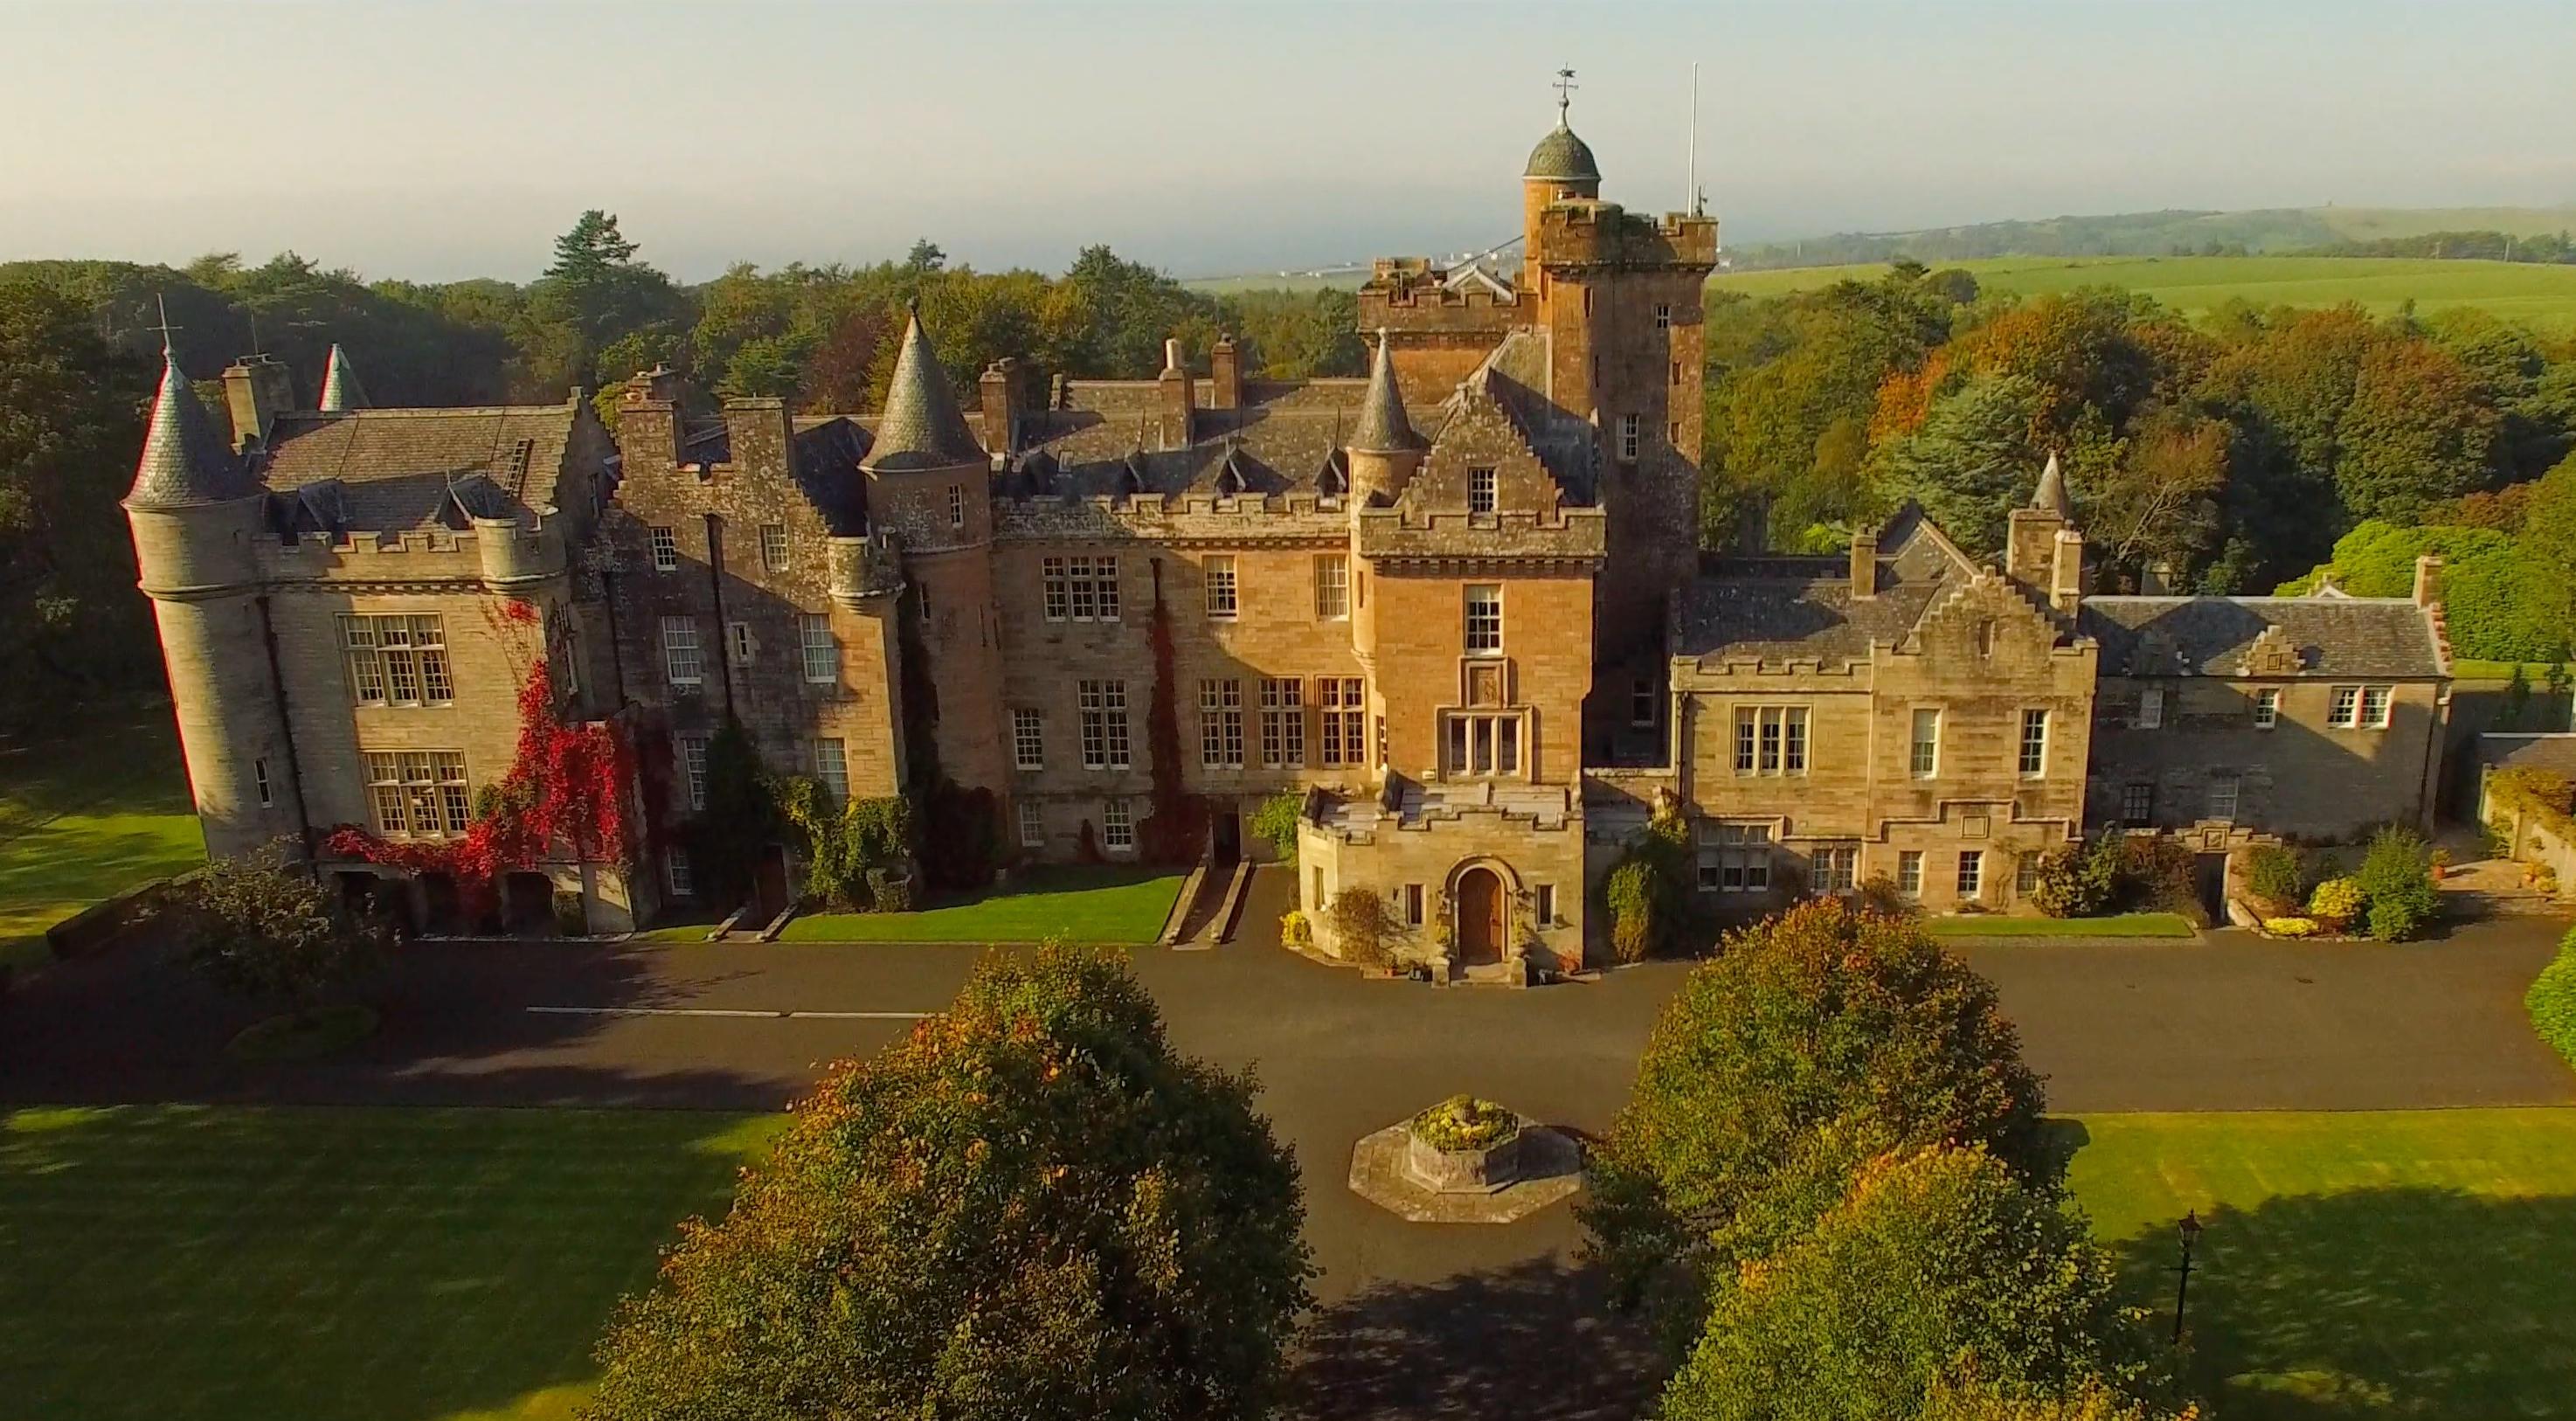 Glenapp Castle, Ayrshire